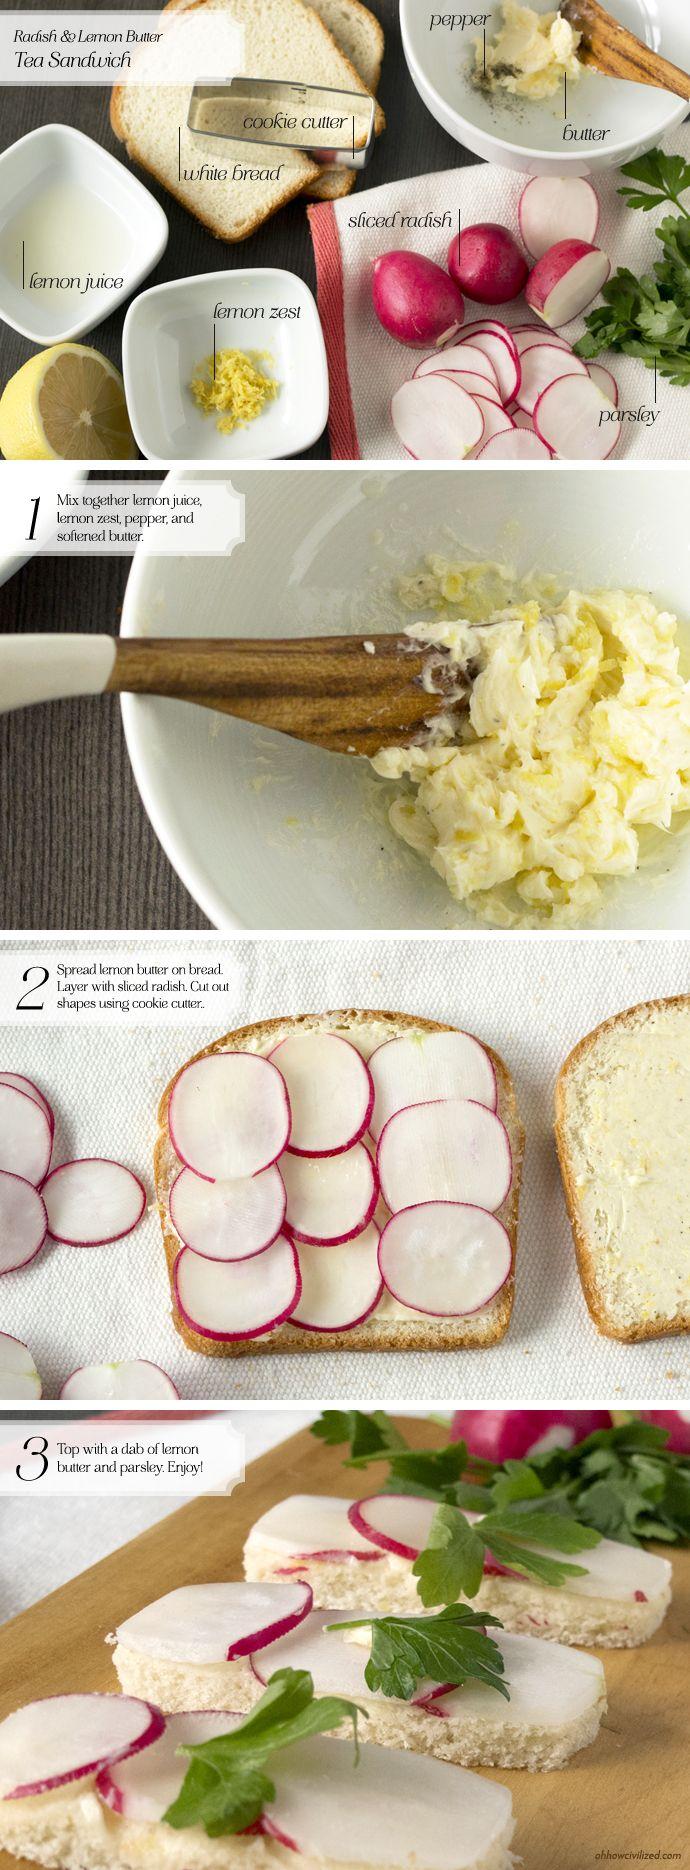 Tea Sandwich: Radish & Lemon butter